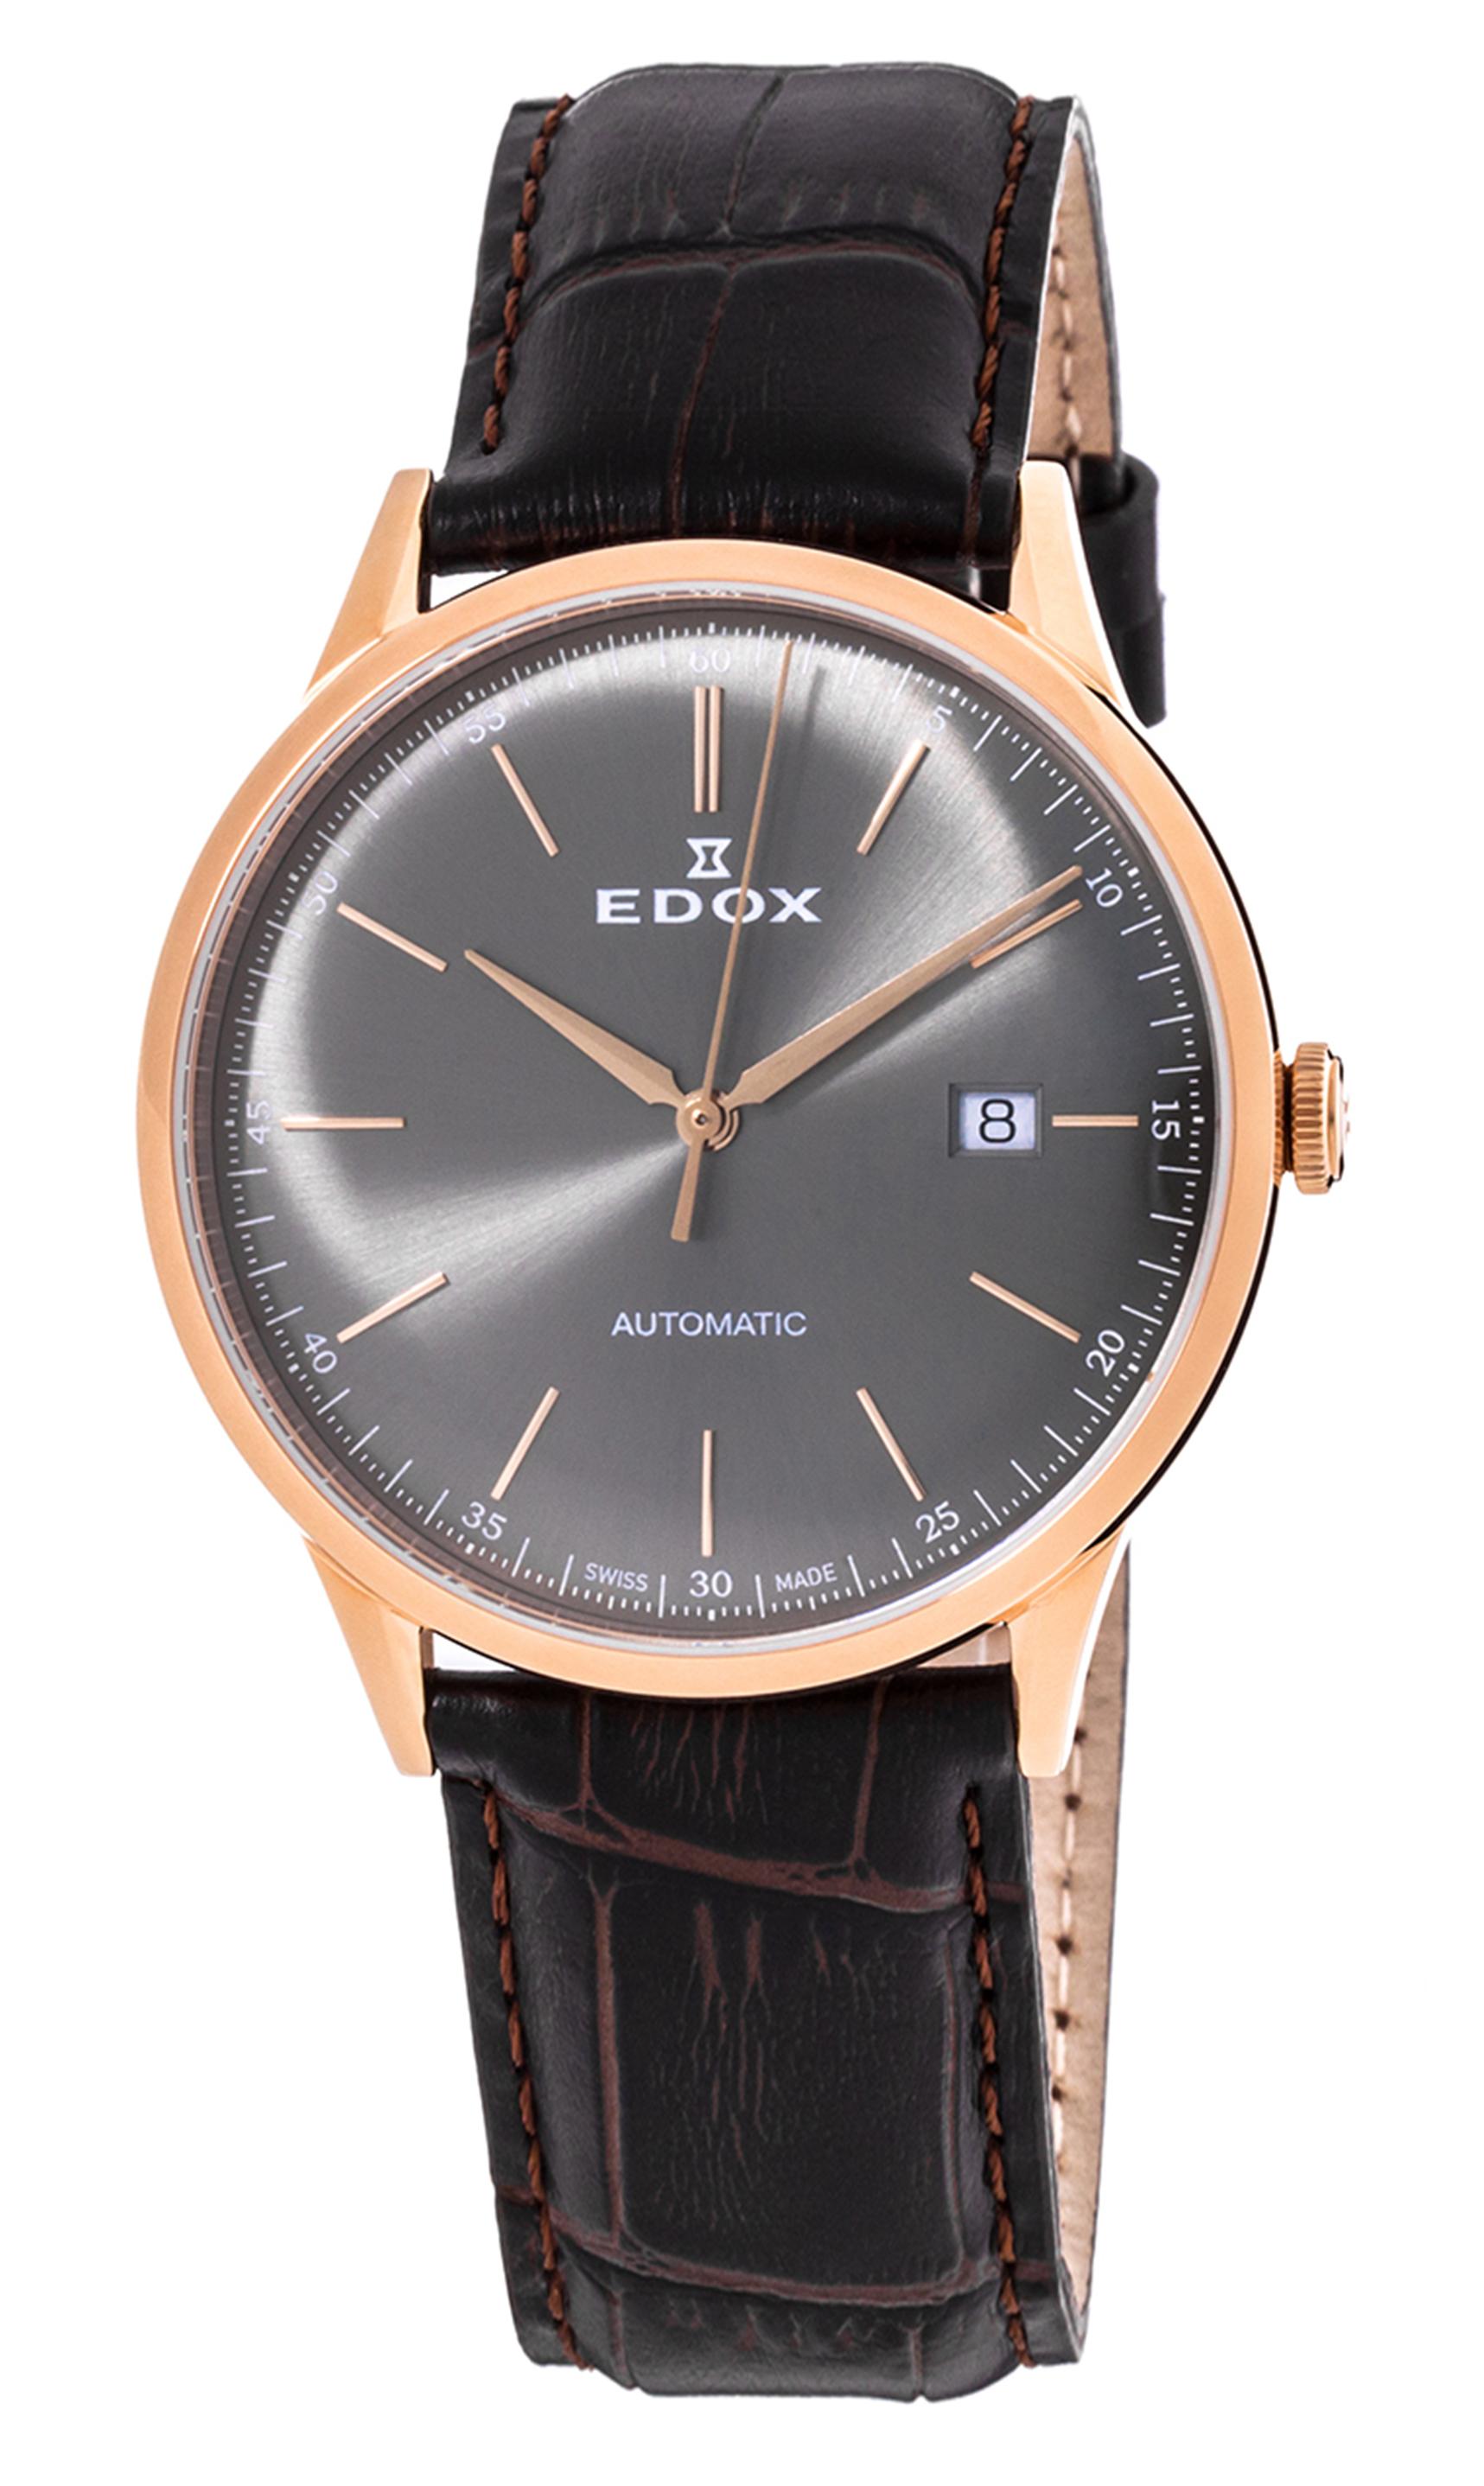 Часы Edox Les Vauberts Automatic Date 80106 37RC GIR